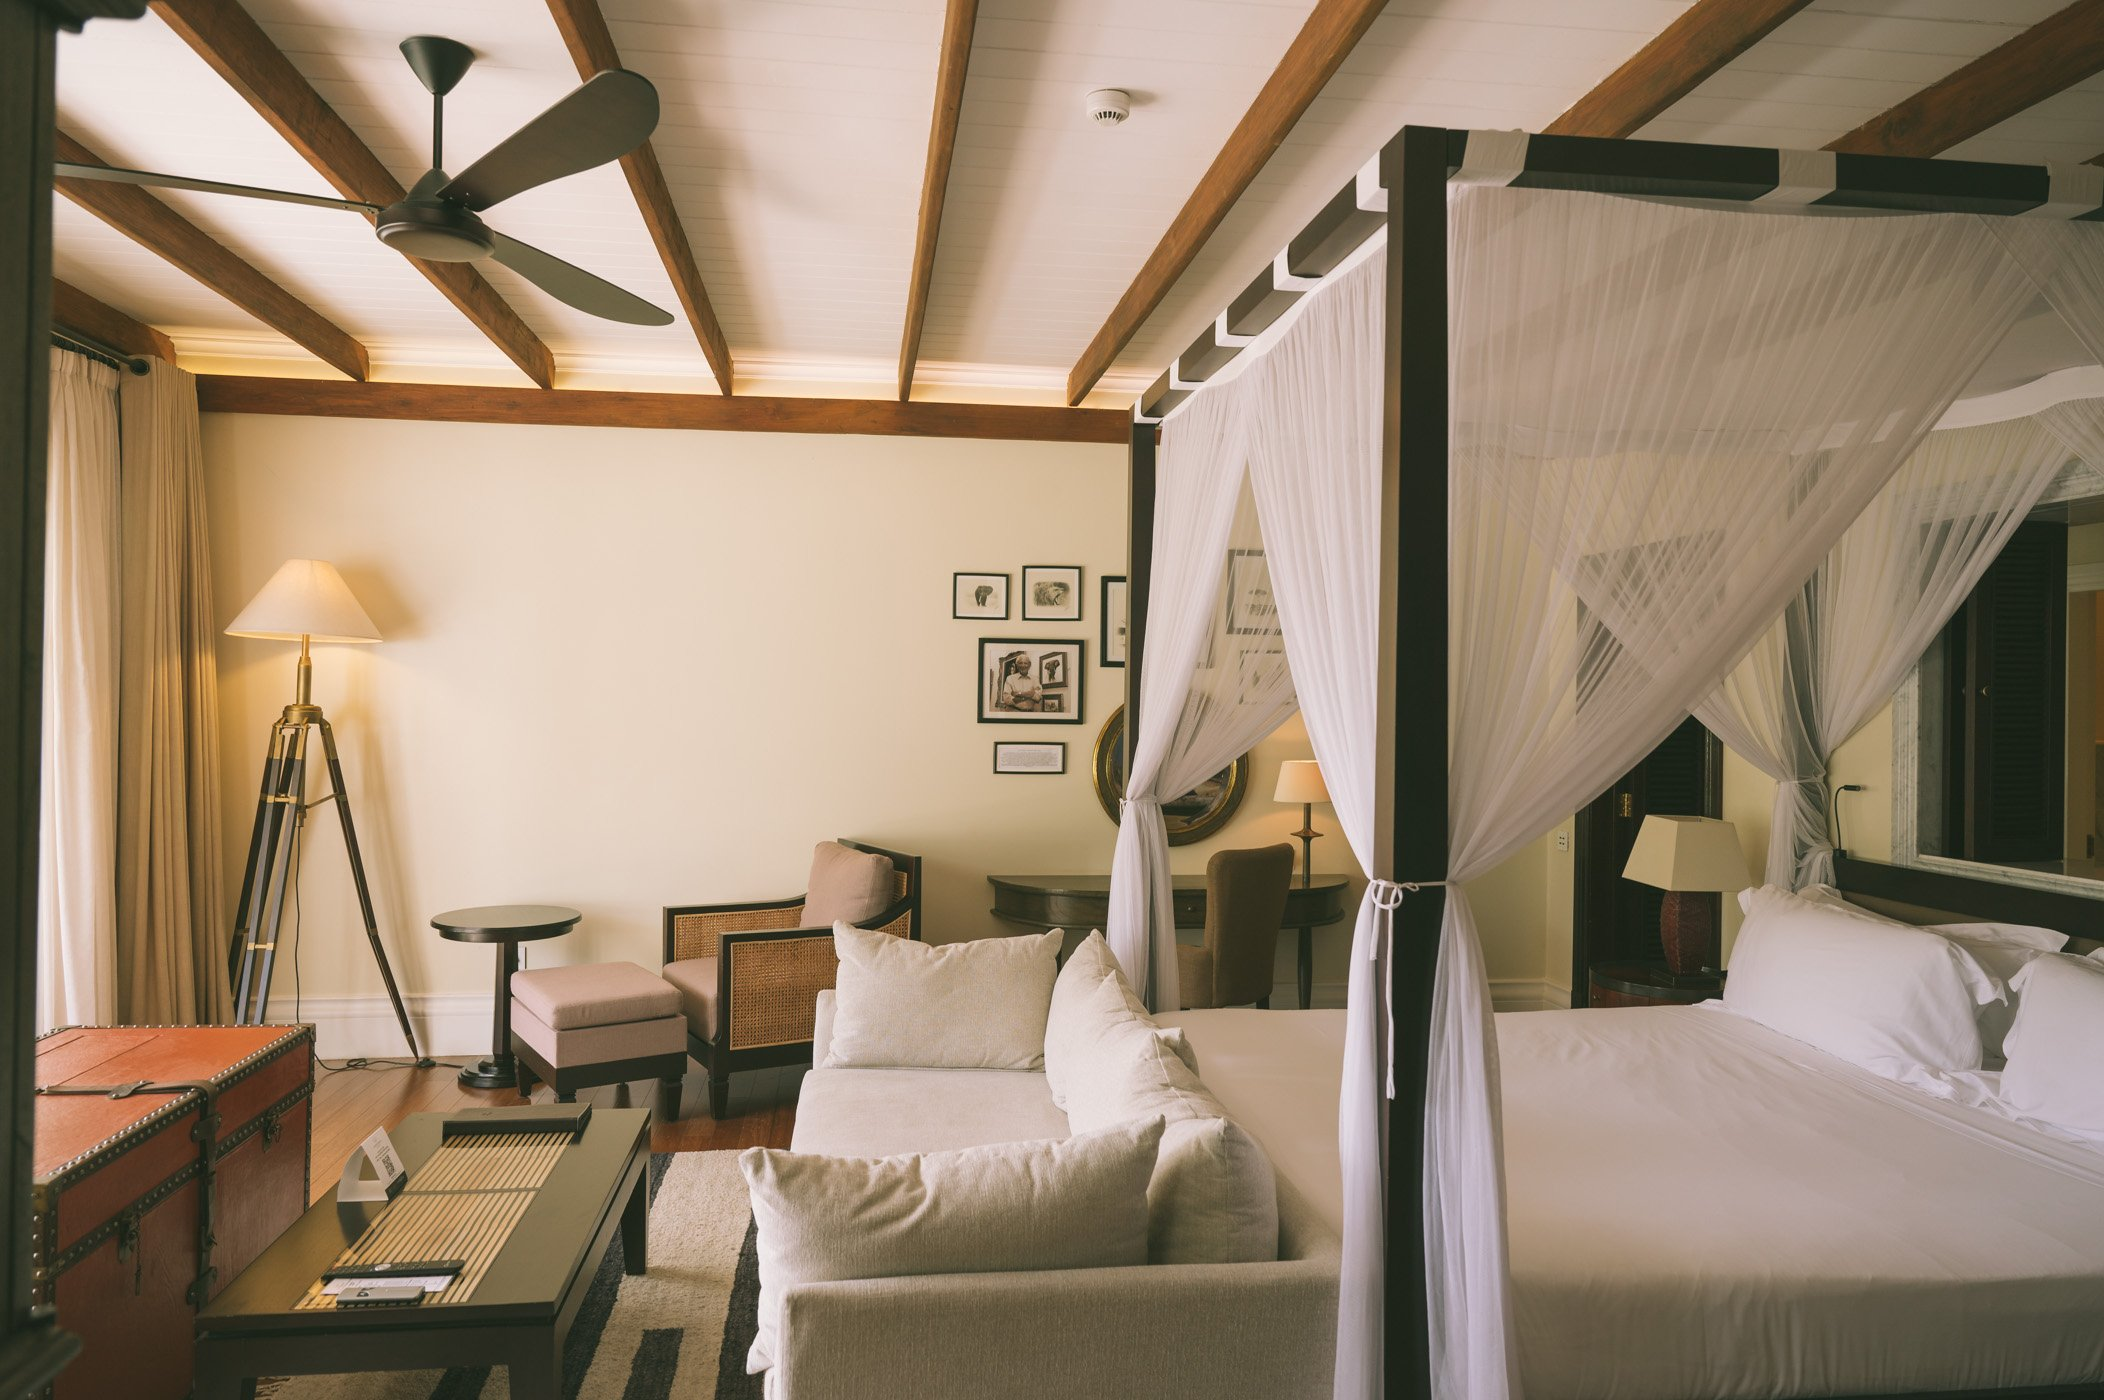 Hemingway's Nairobi Hotel in Kenya